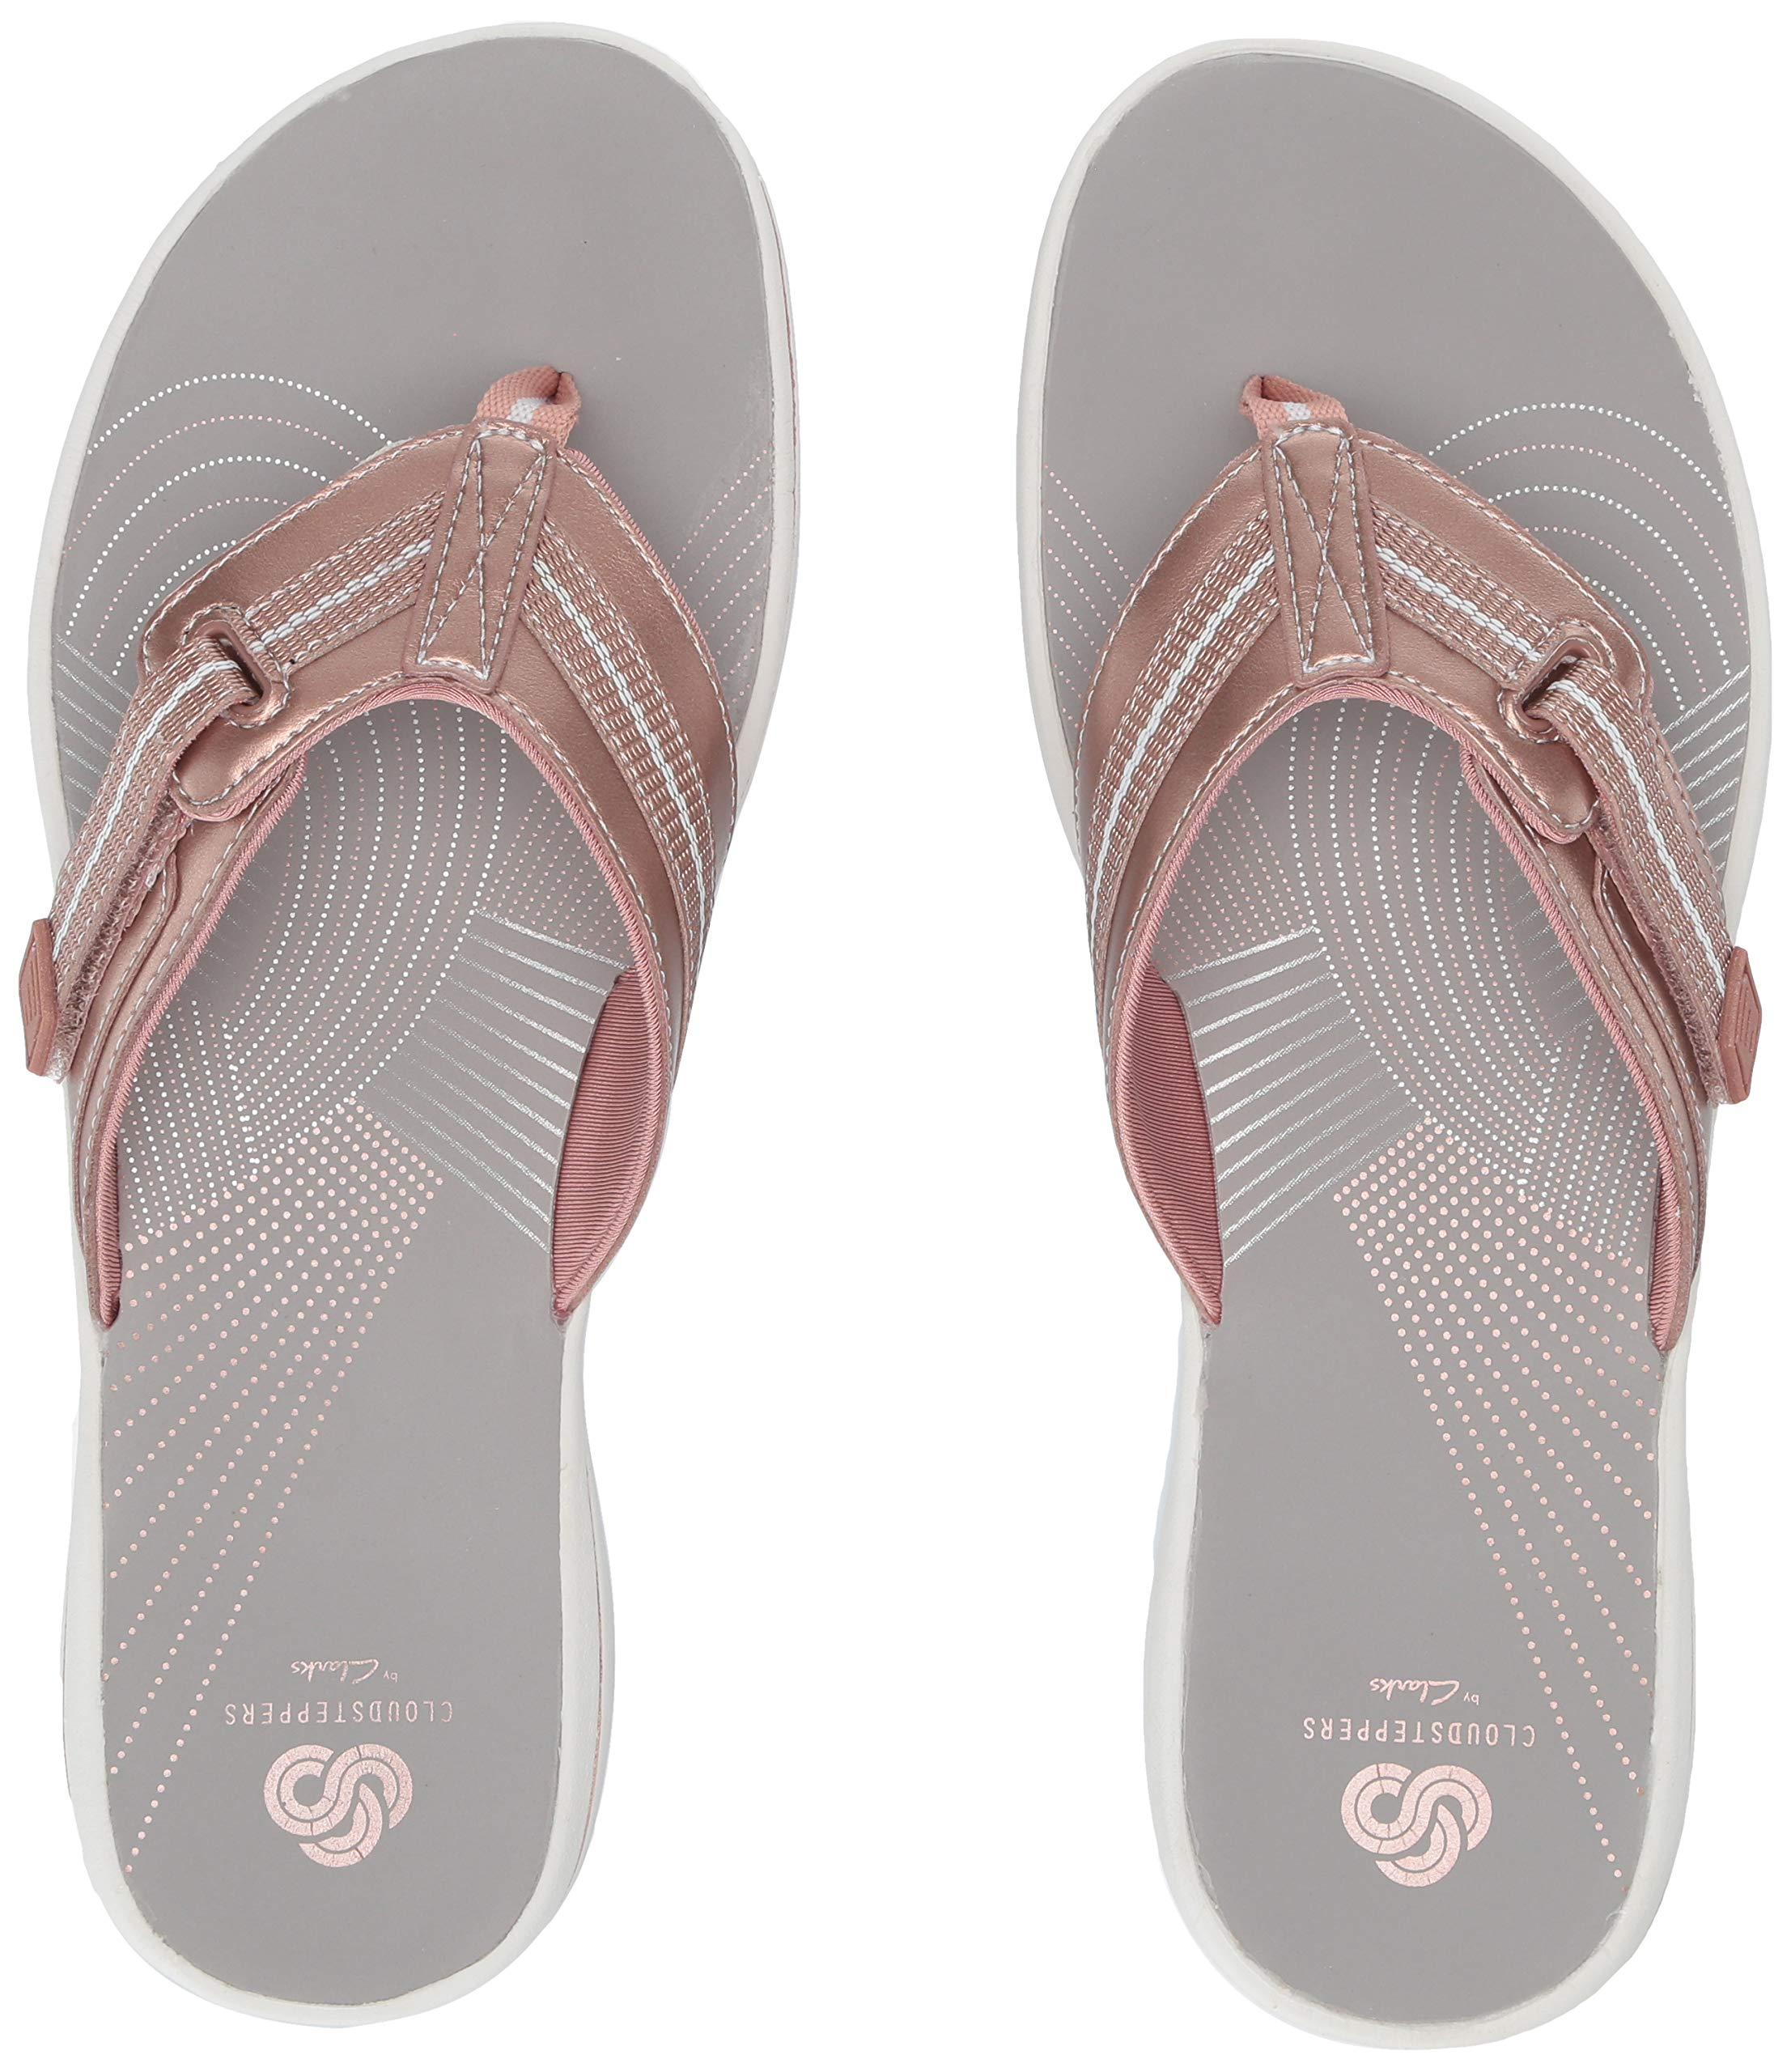 8dd36470fa0 Best Rated in Women s Flip-Flops   Helpful Customer Reviews - Amazon.com